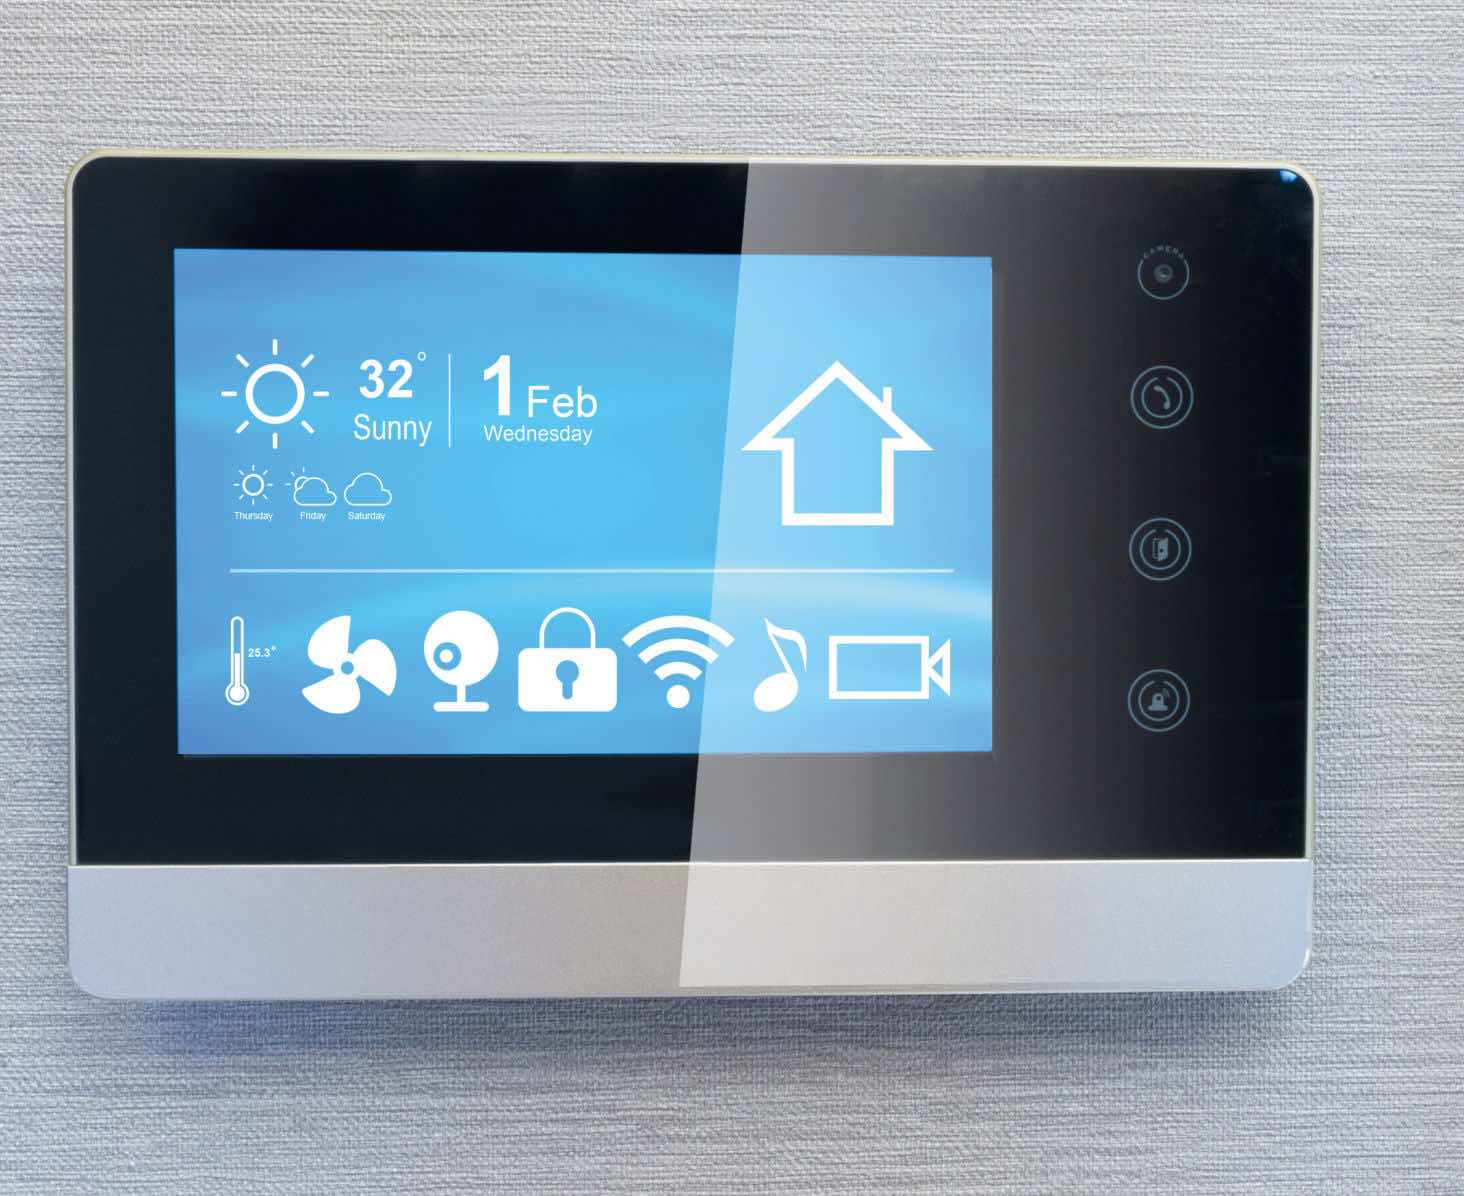 Omron Says Usb Environmental Sensor Monitors Seven Functions